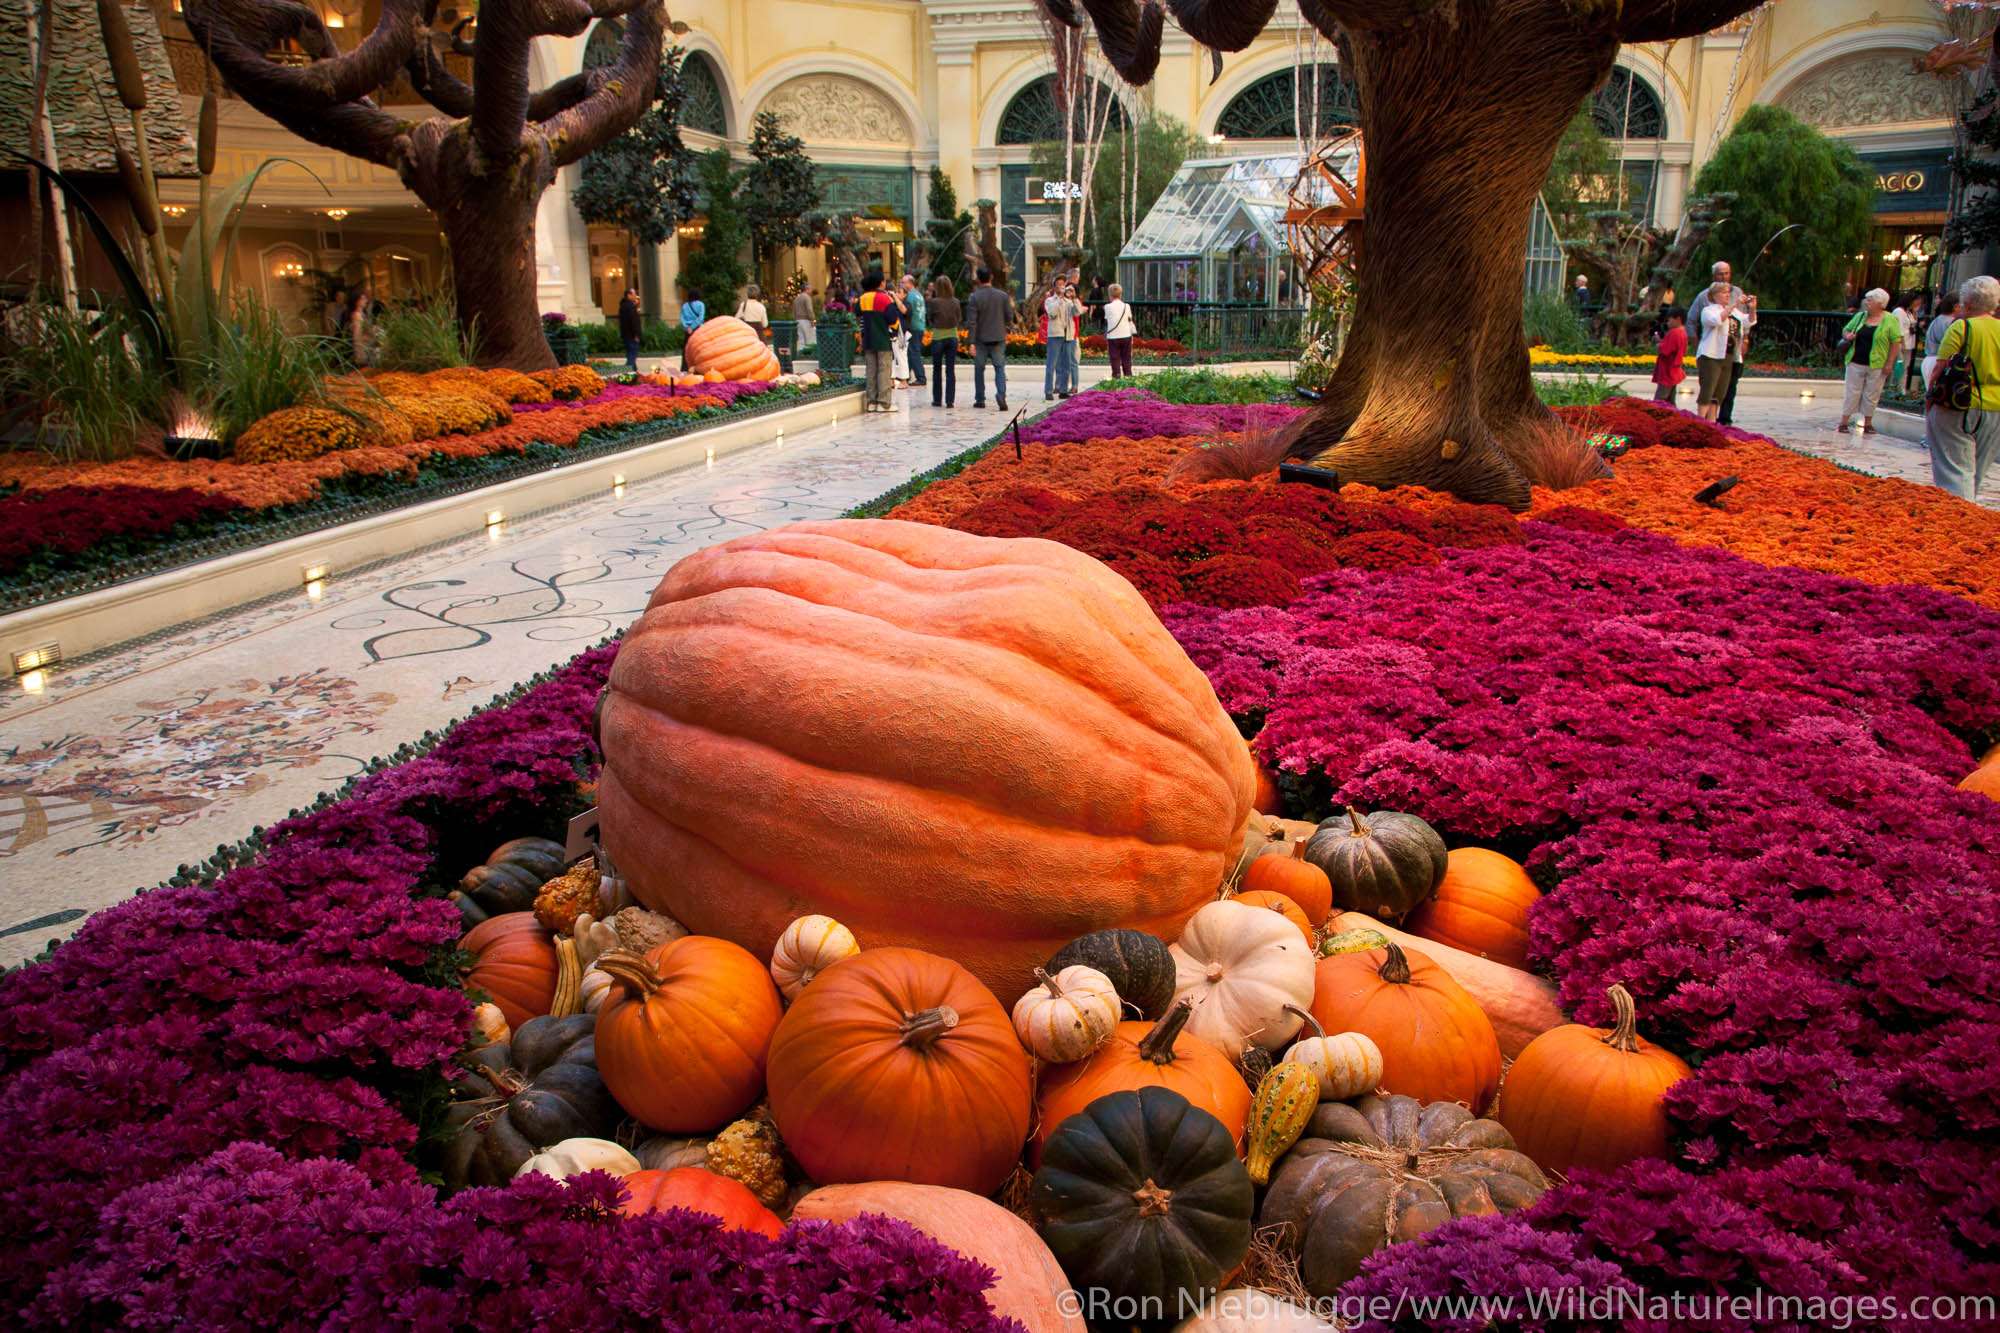 Botanical Gardens inside Bellagio Resort and Casino, Las Vegas, Nevada